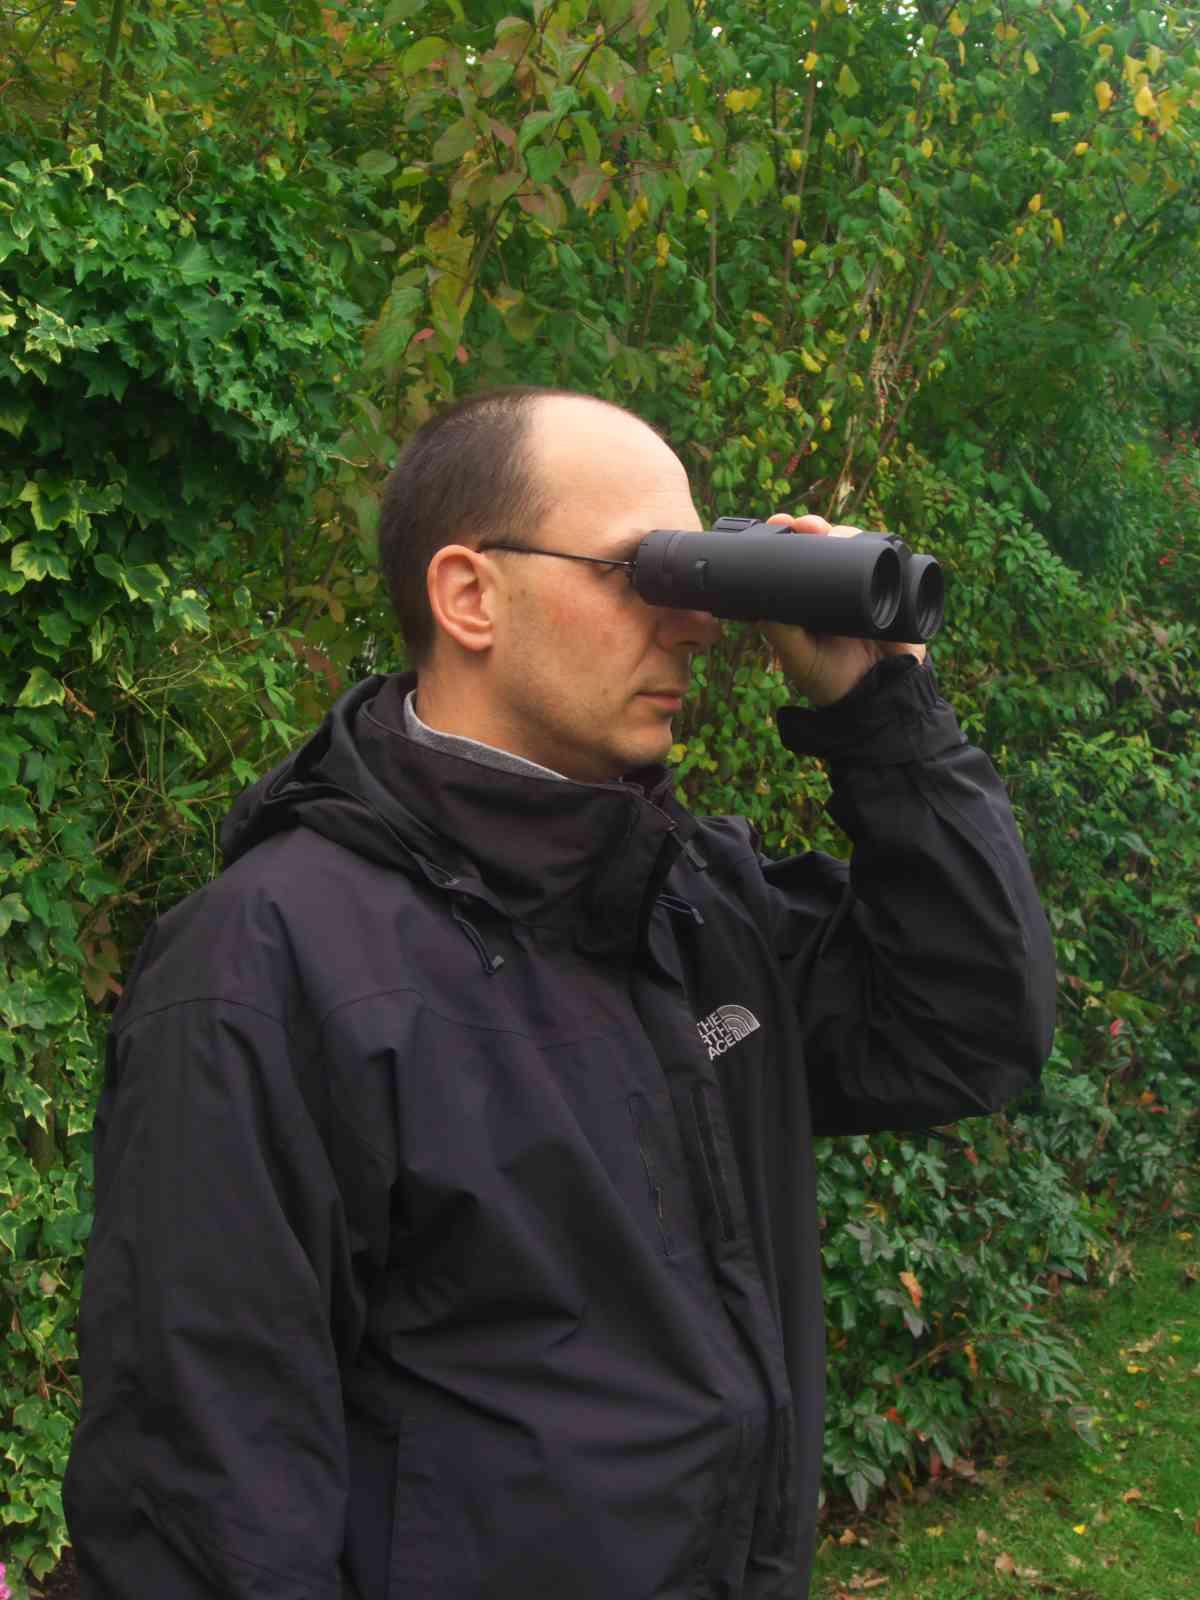 Fernglas im Outdoreinsatz - Naturbeobachtung